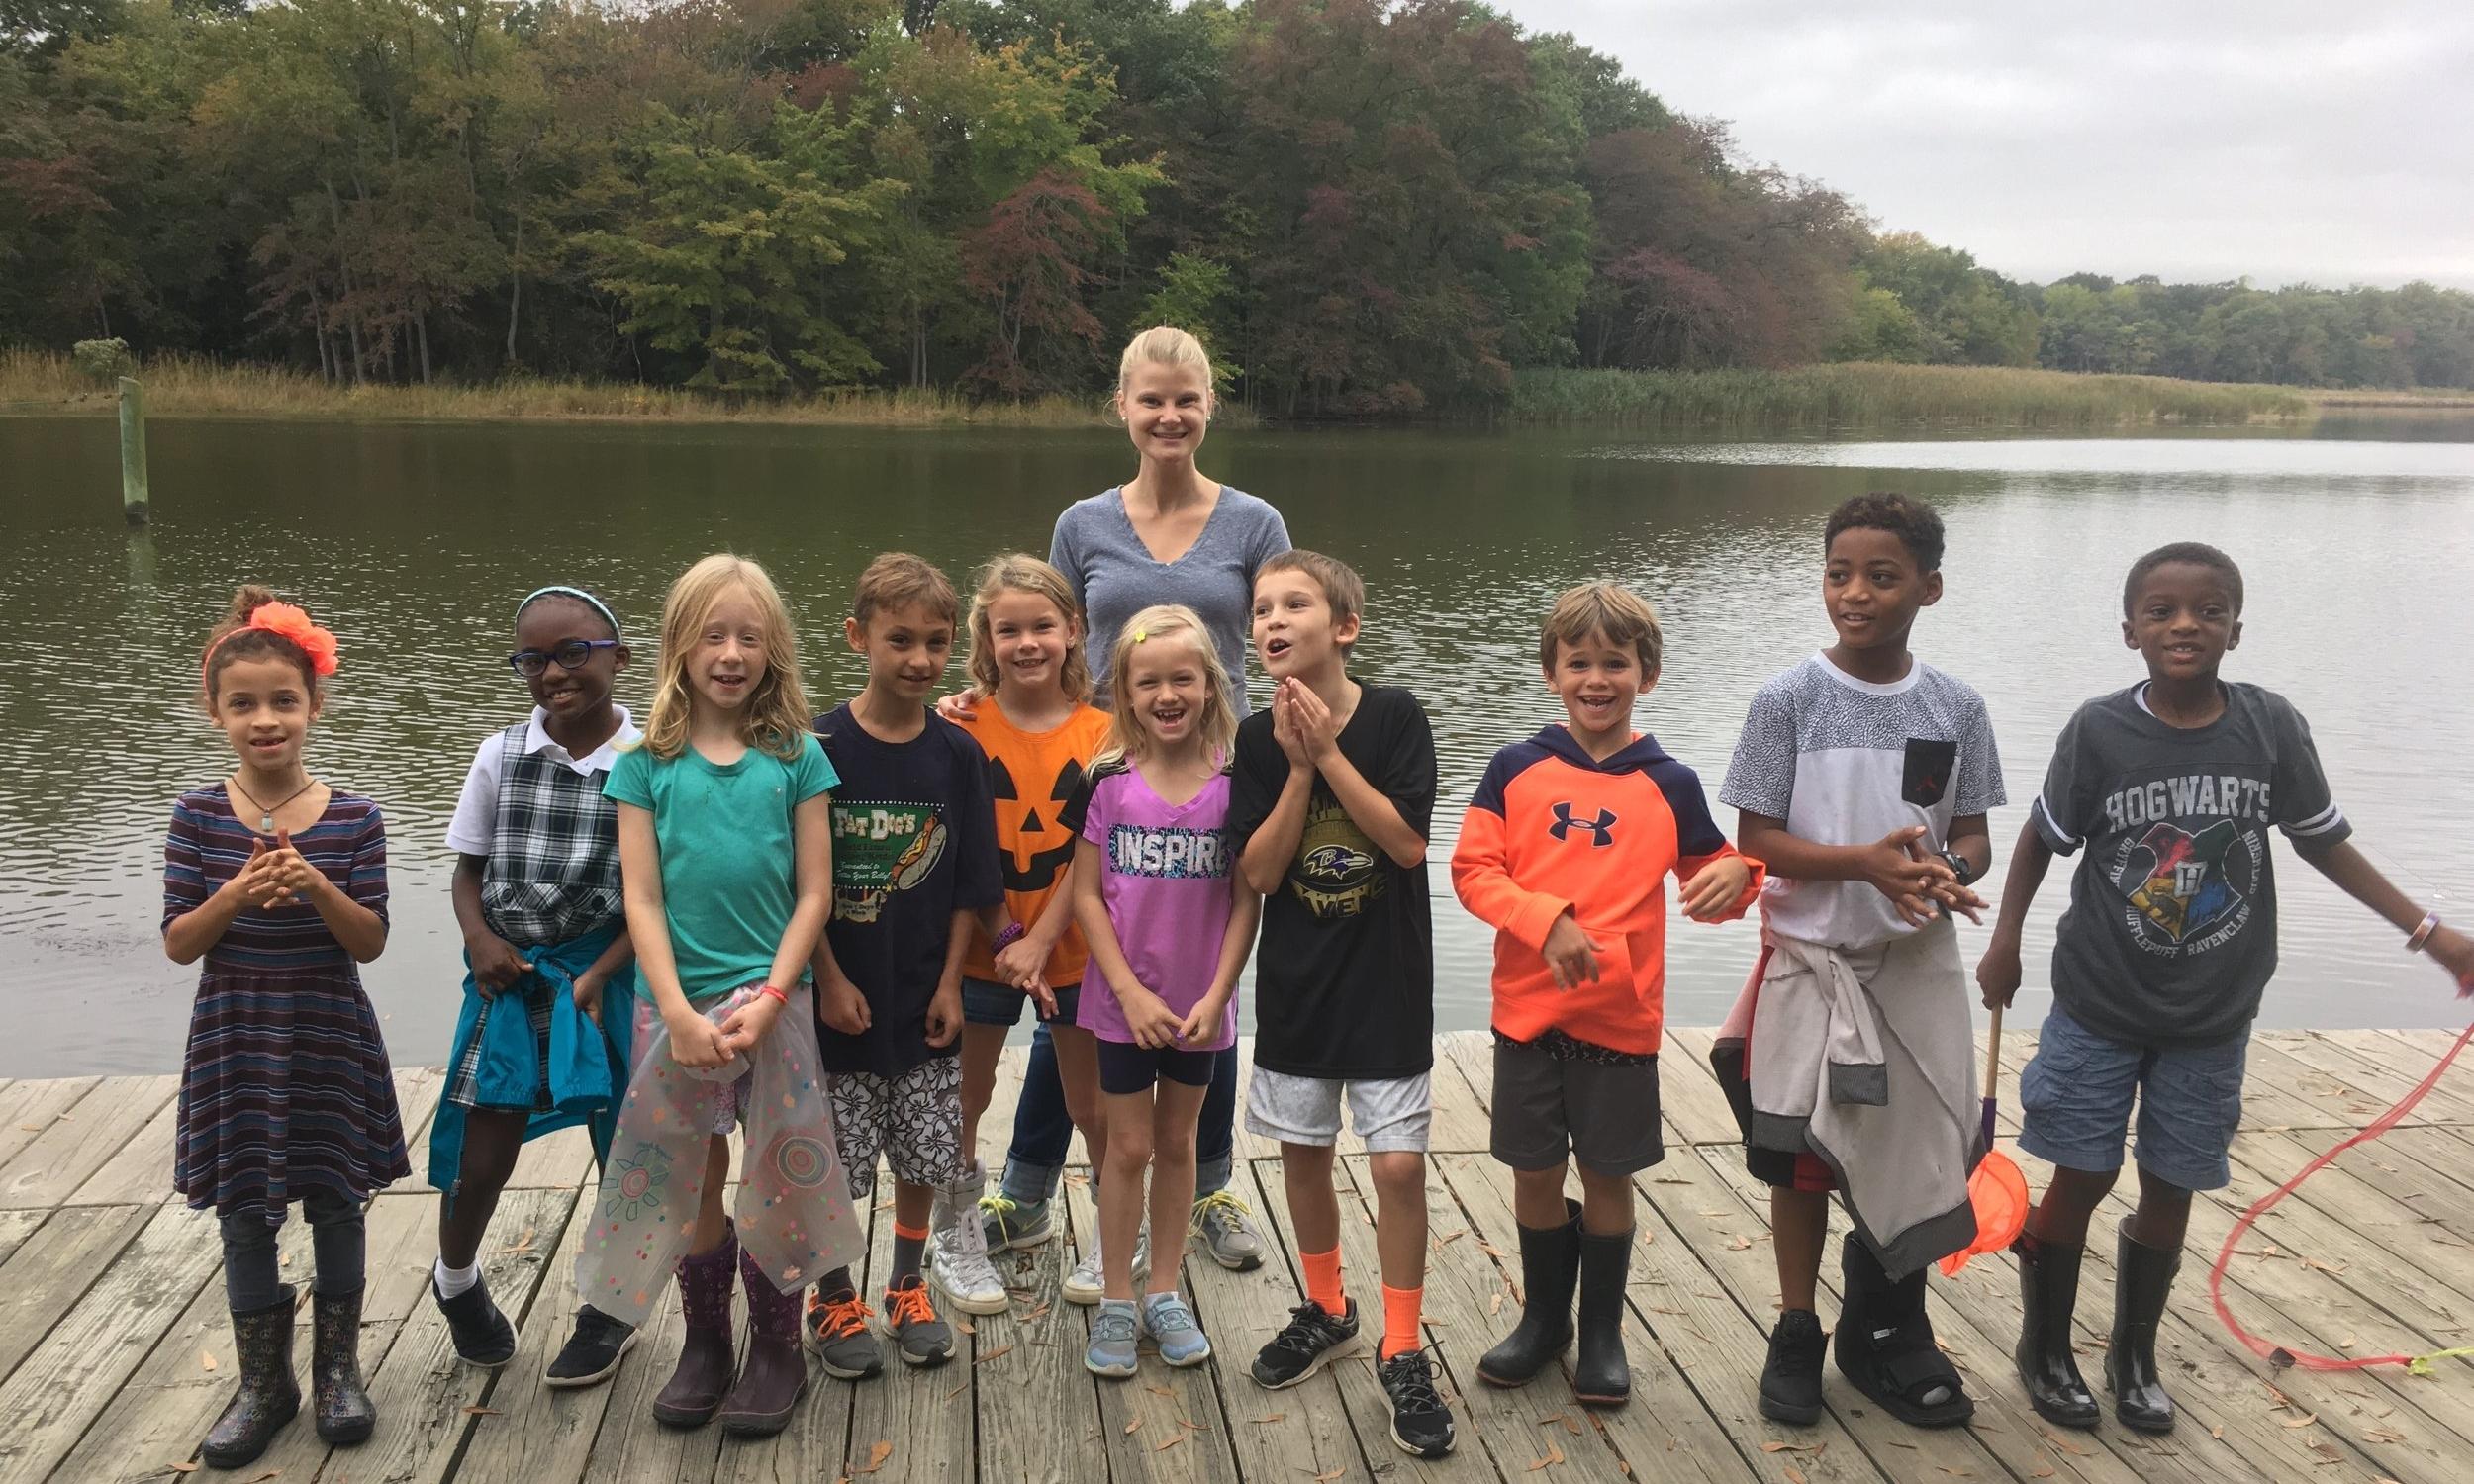 2nd grade students explore waterways at Gunpowder State Park.